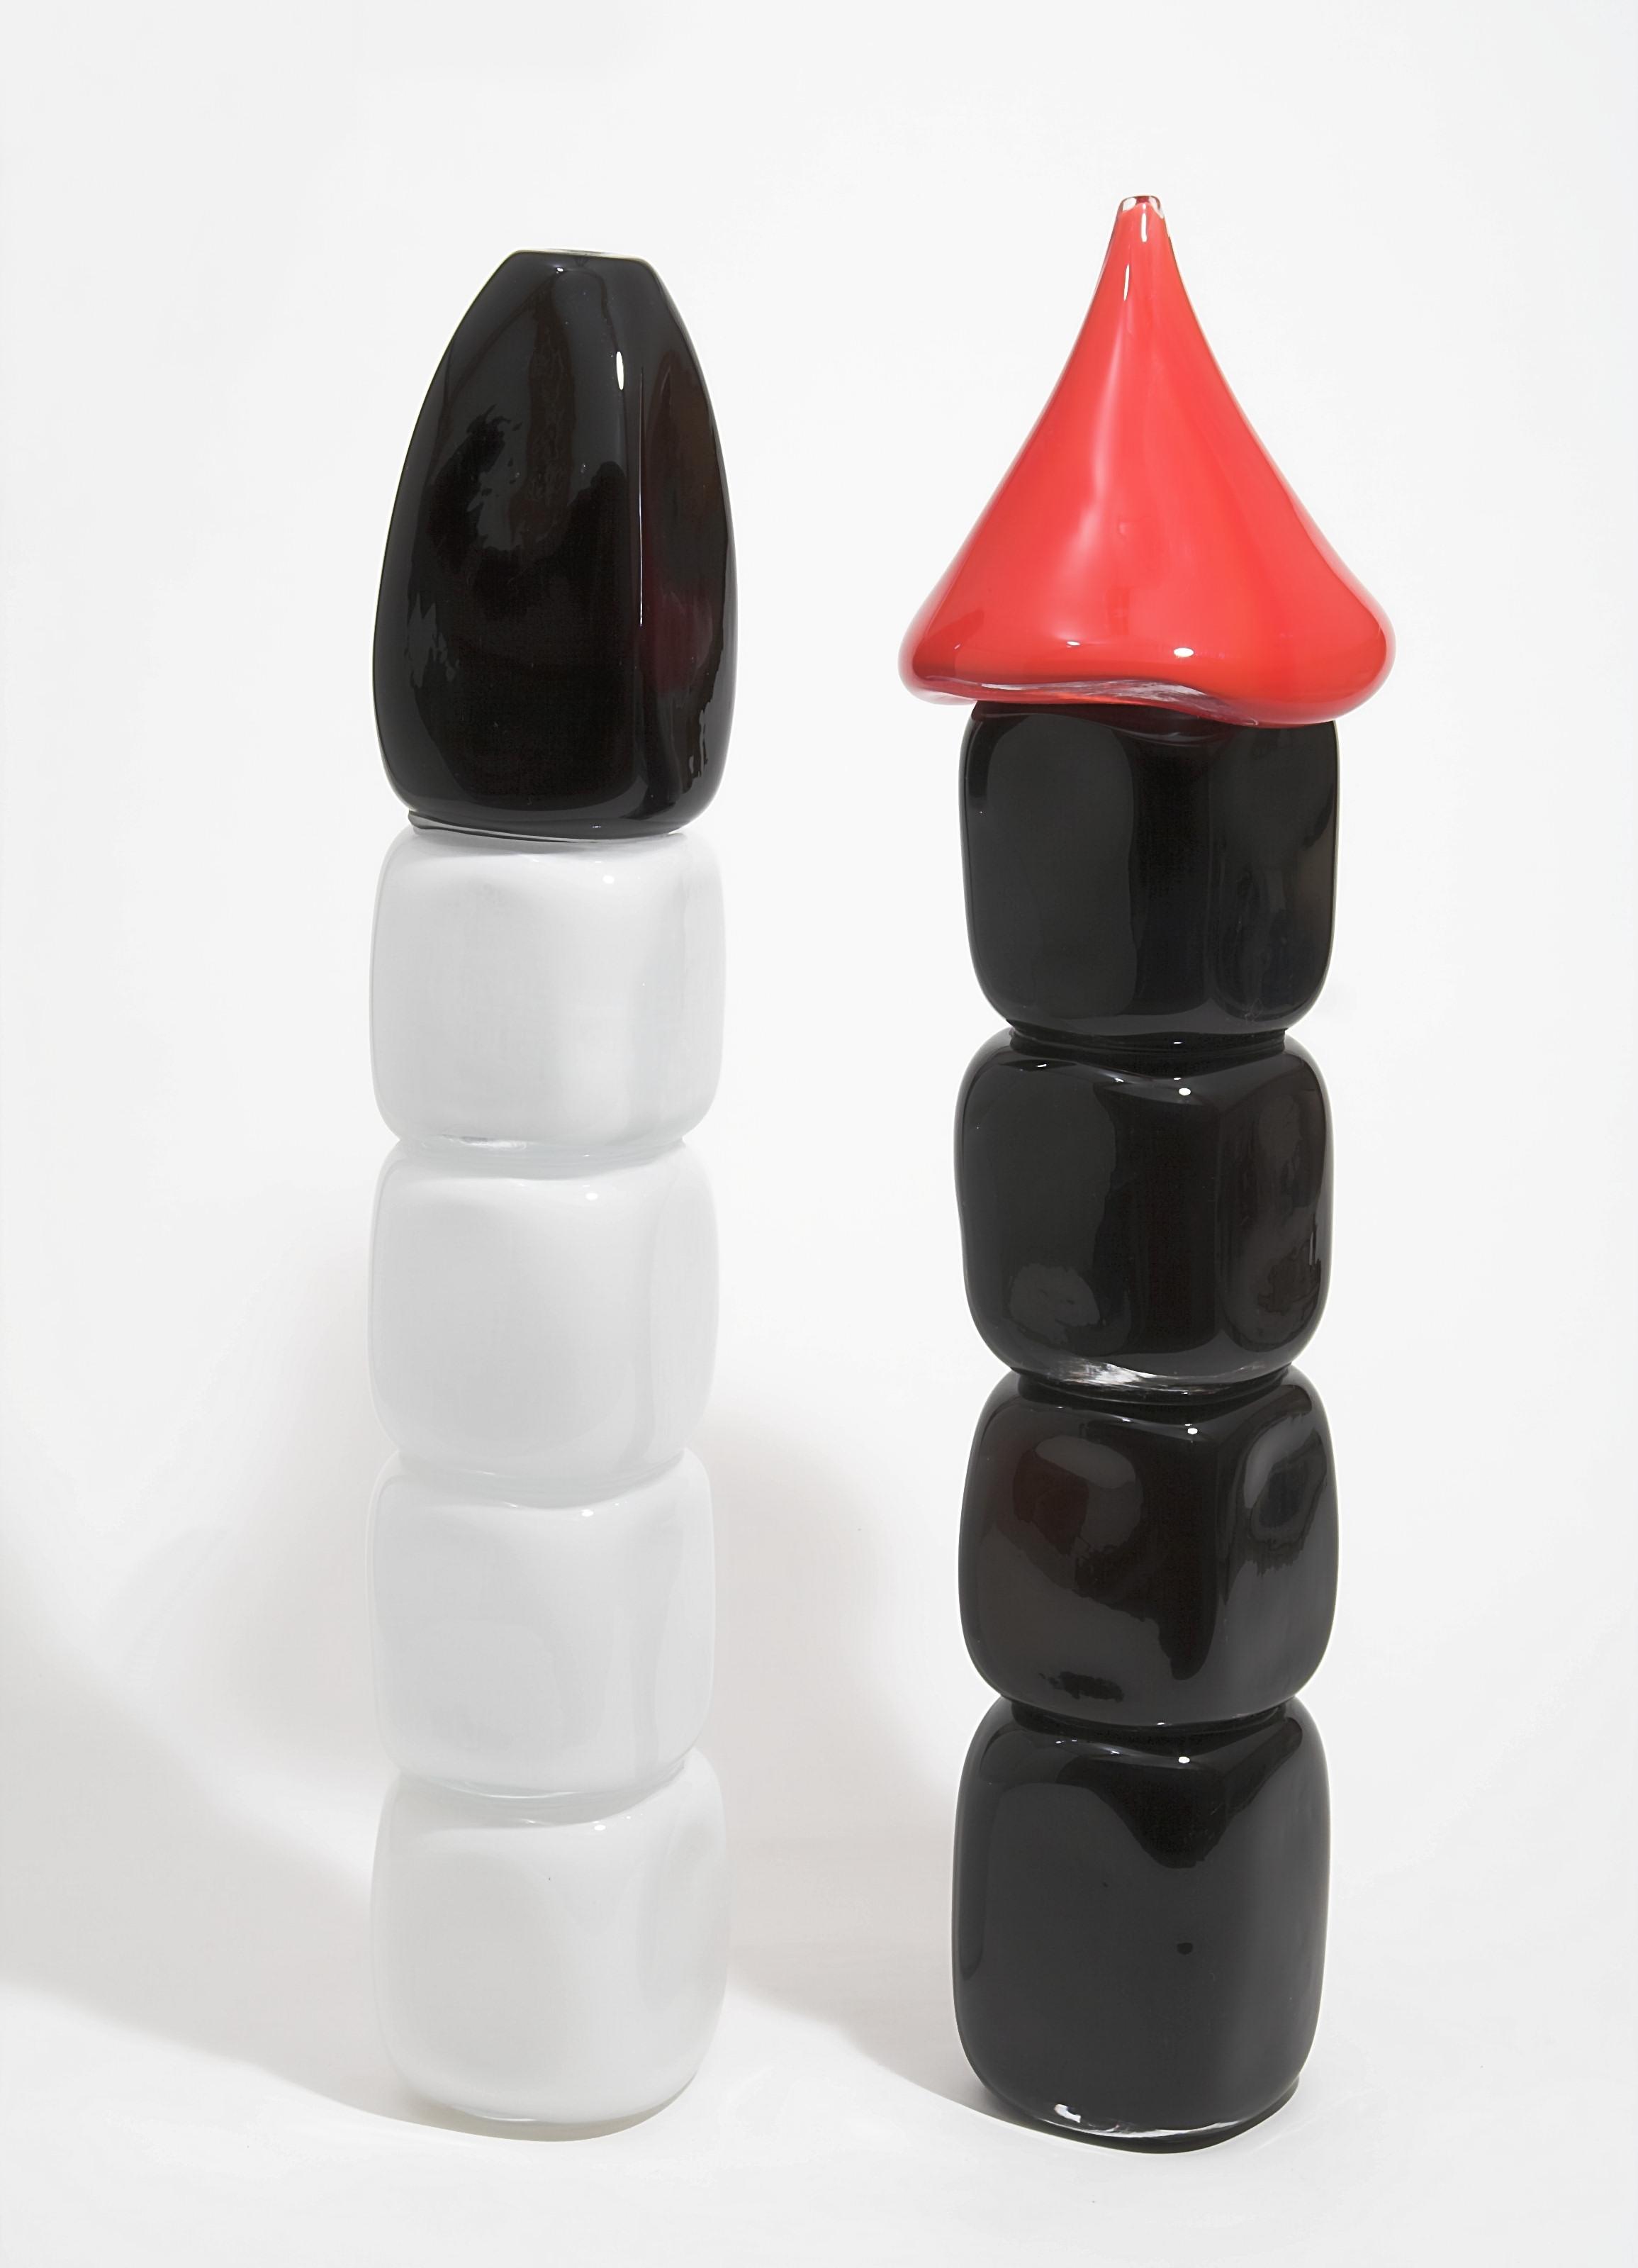 Stapel-zot, zwart-wit-rood, groot